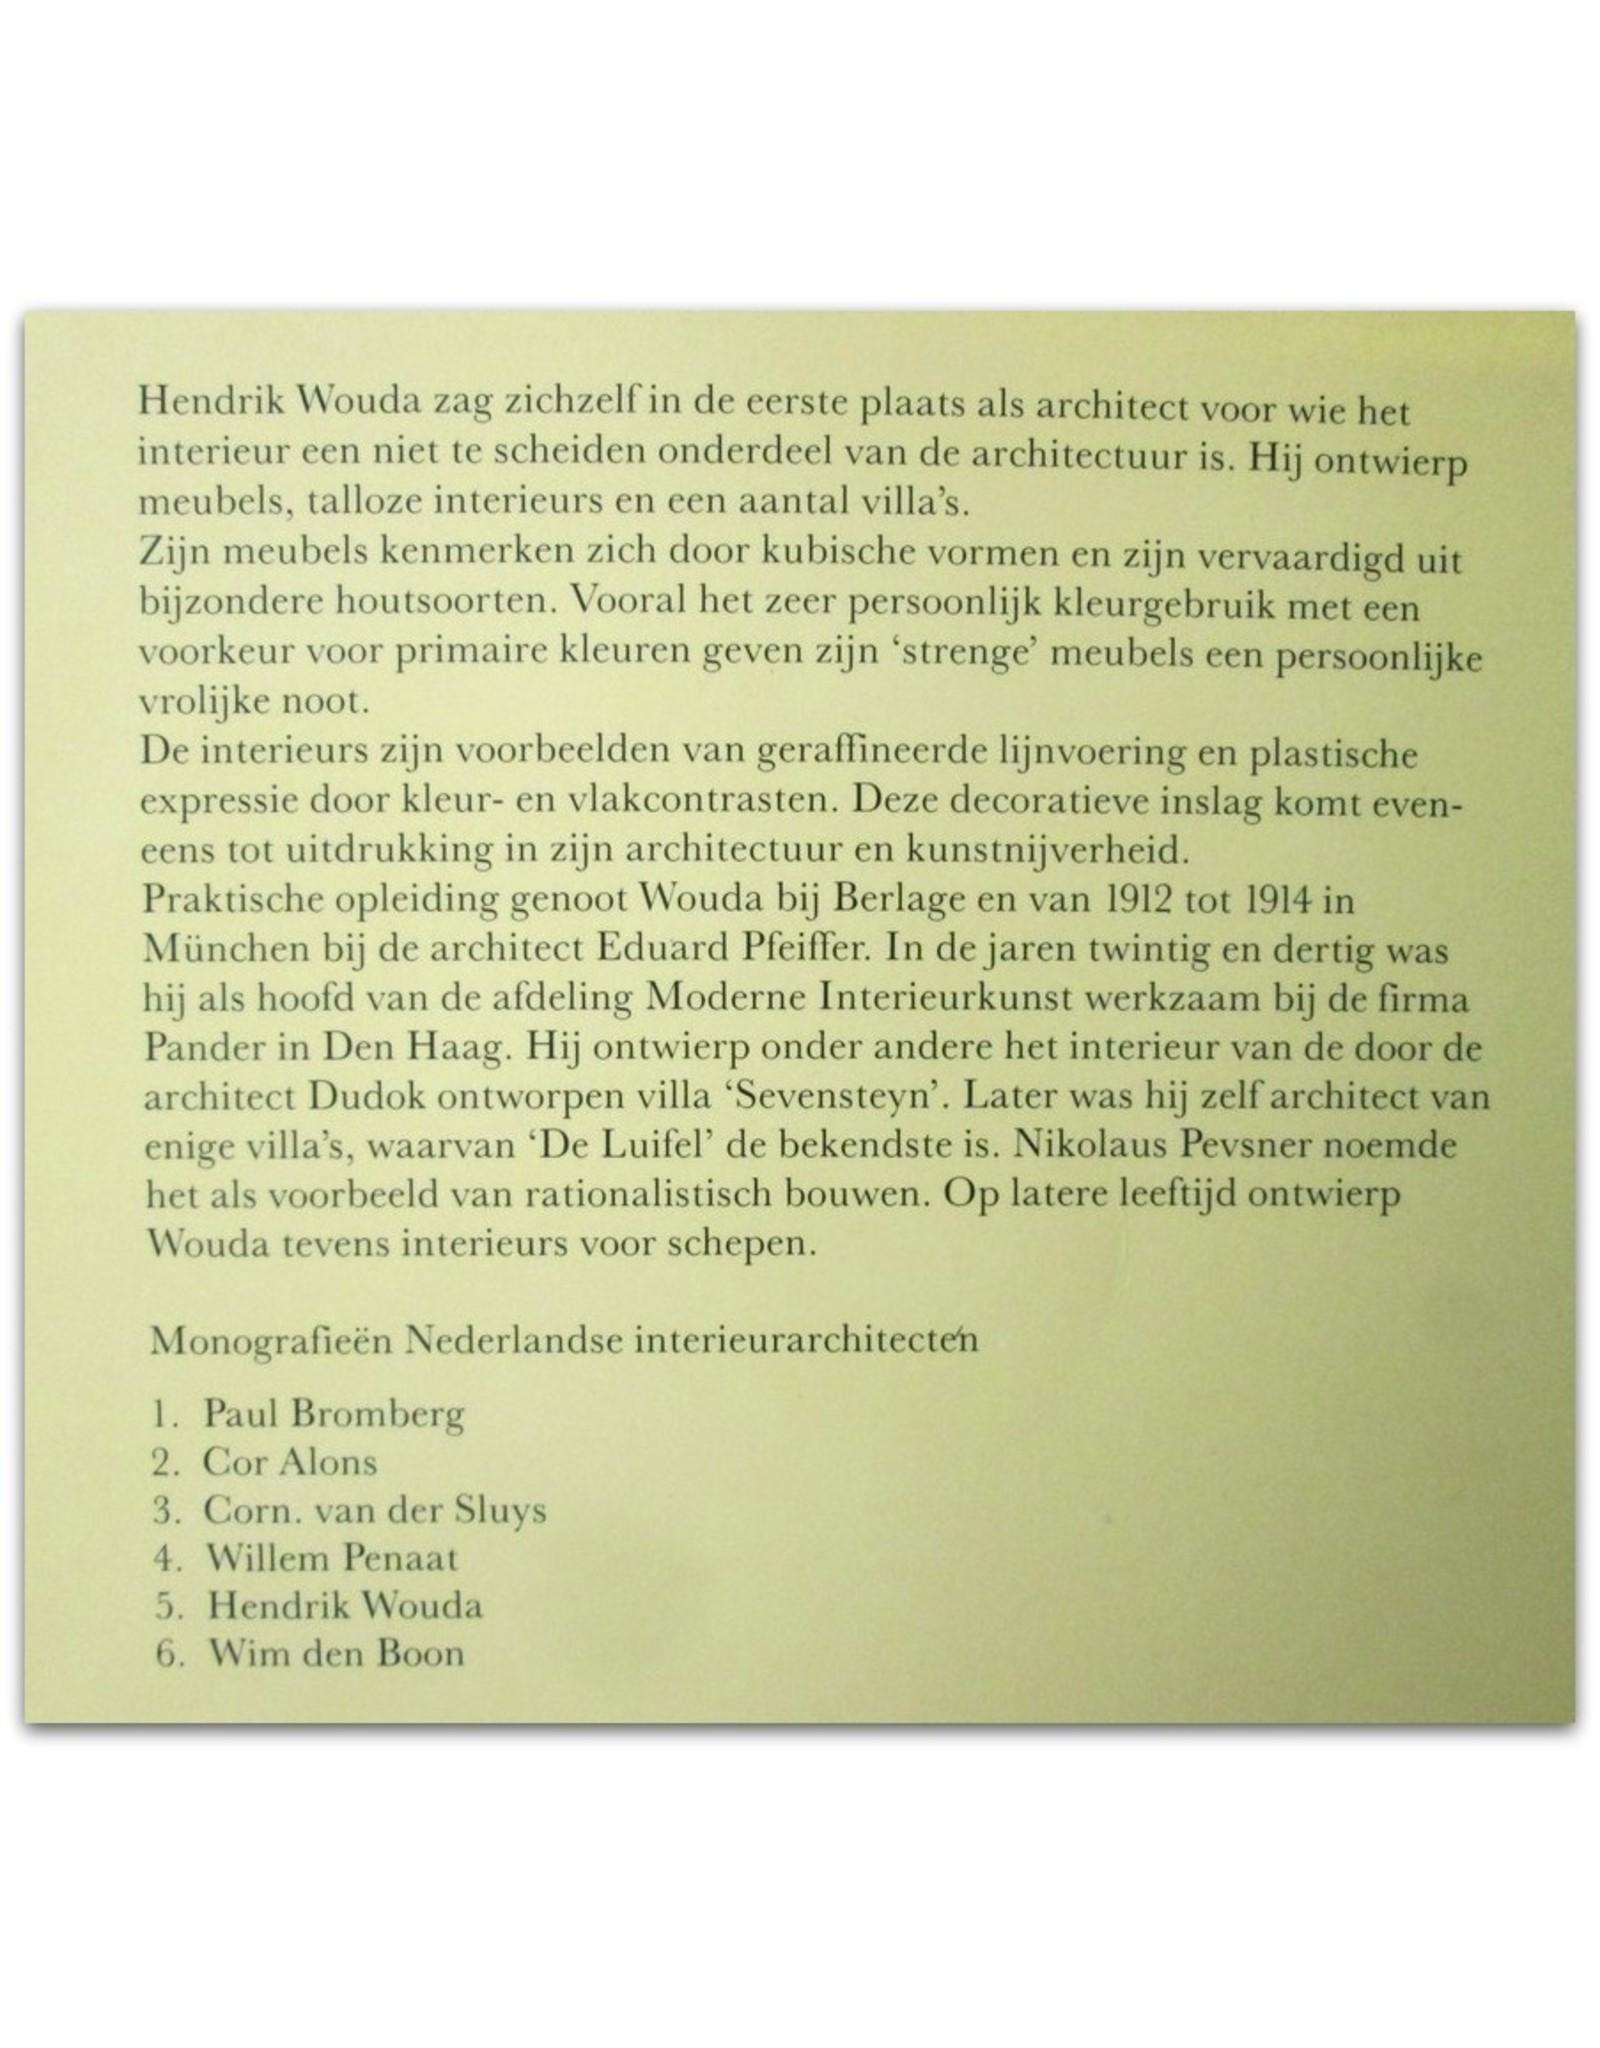 Hendrik Wouda: Architect en meubelontwerper (1885-1946)